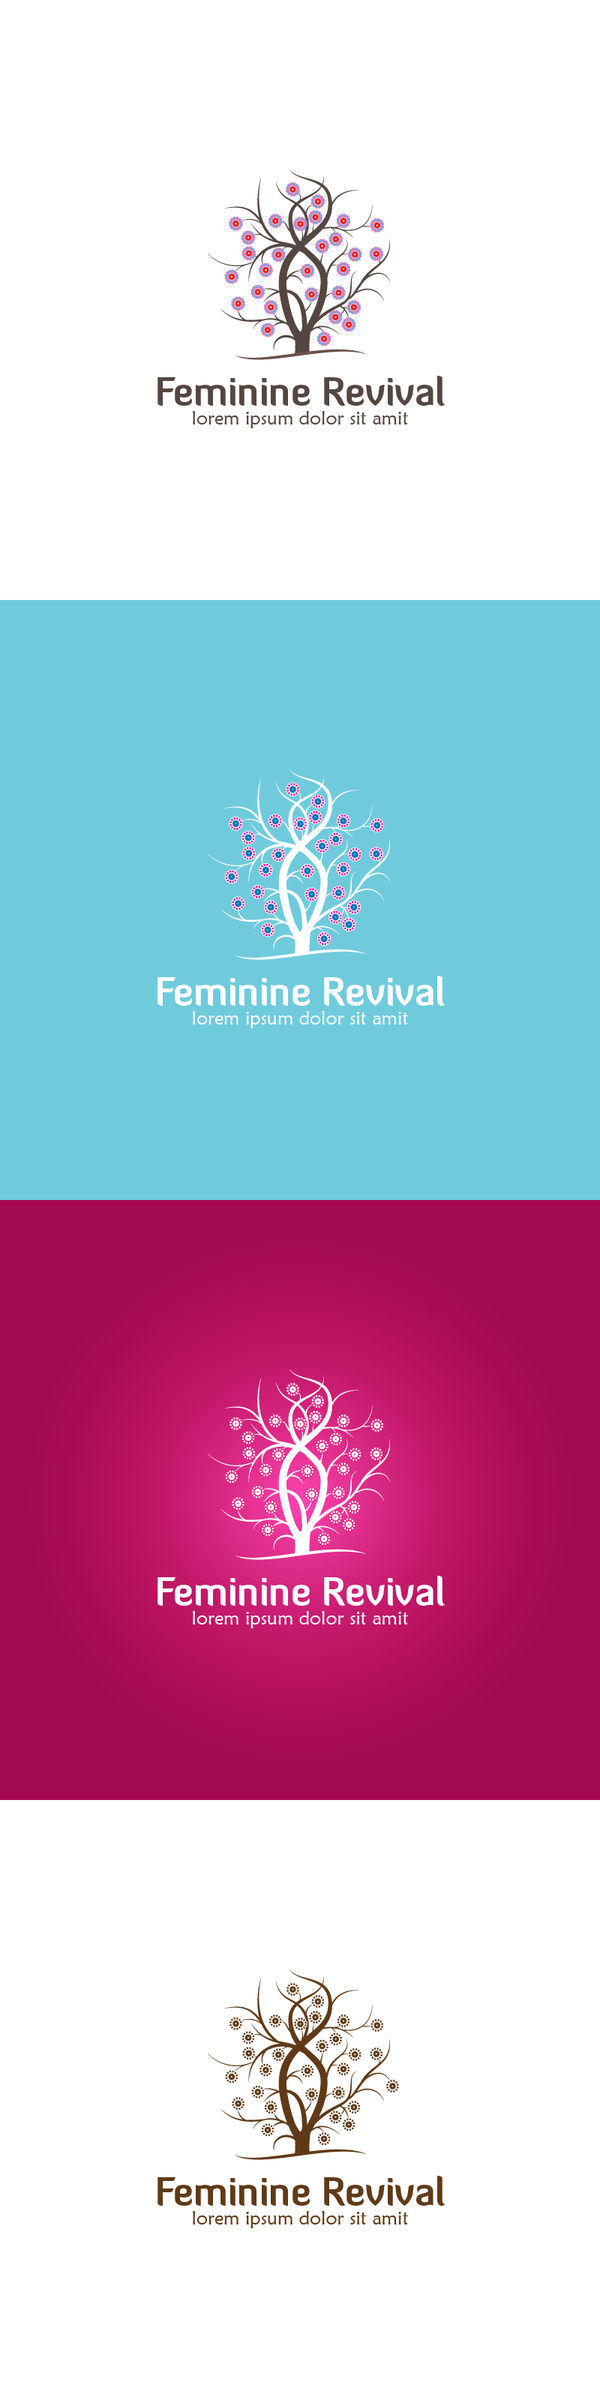 Feminine Revival by AryaInk